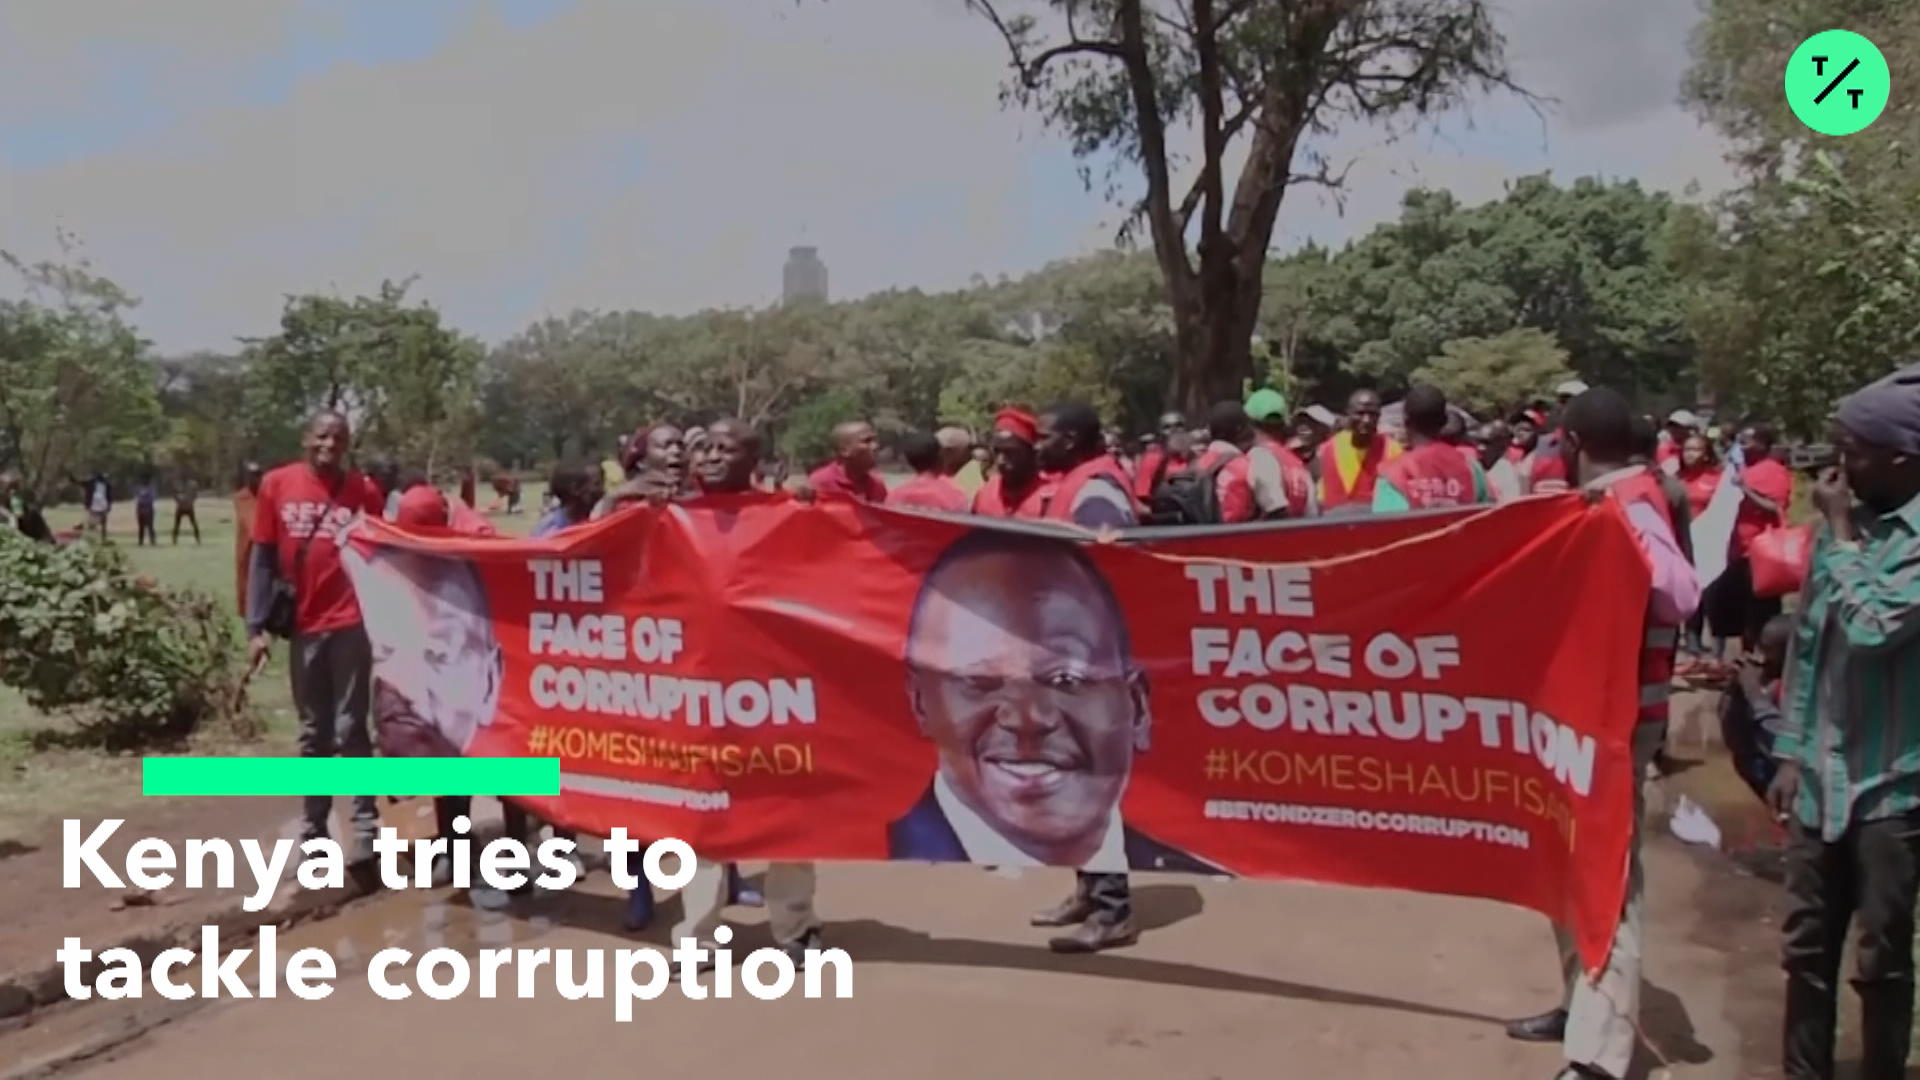 Kenya Fights Corruption